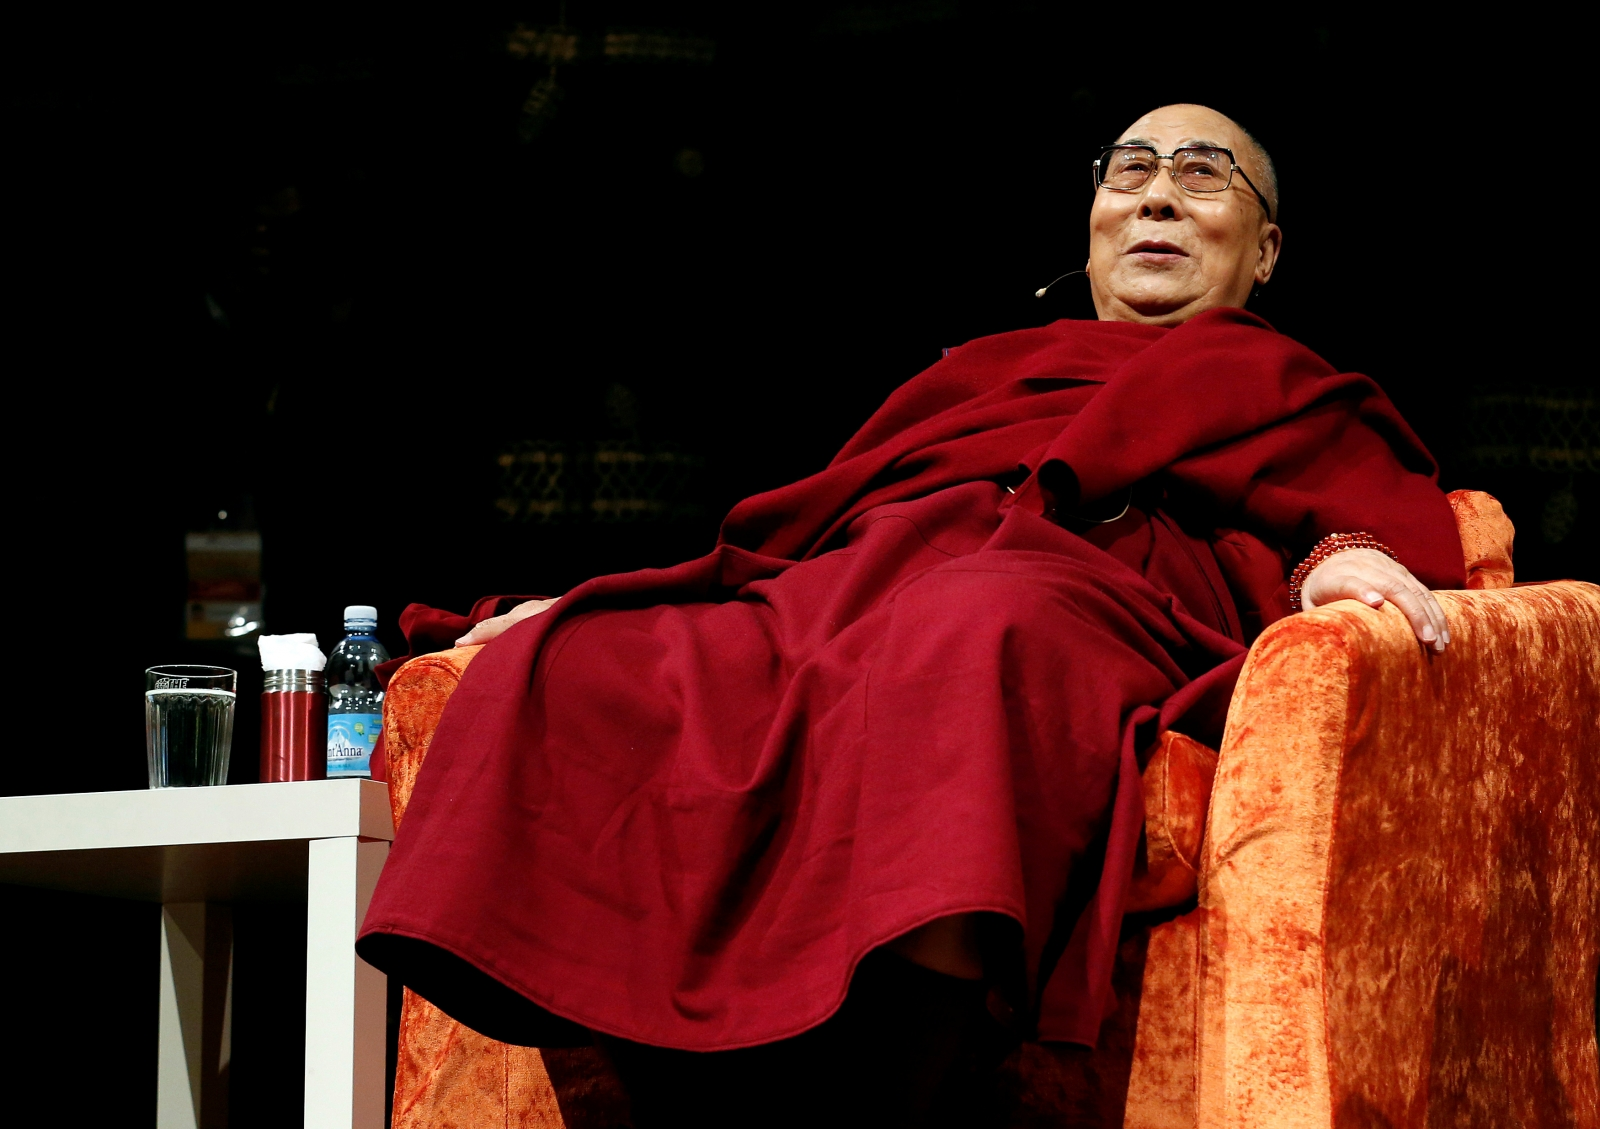 Dalai Lama Arunachal Pradesh visit